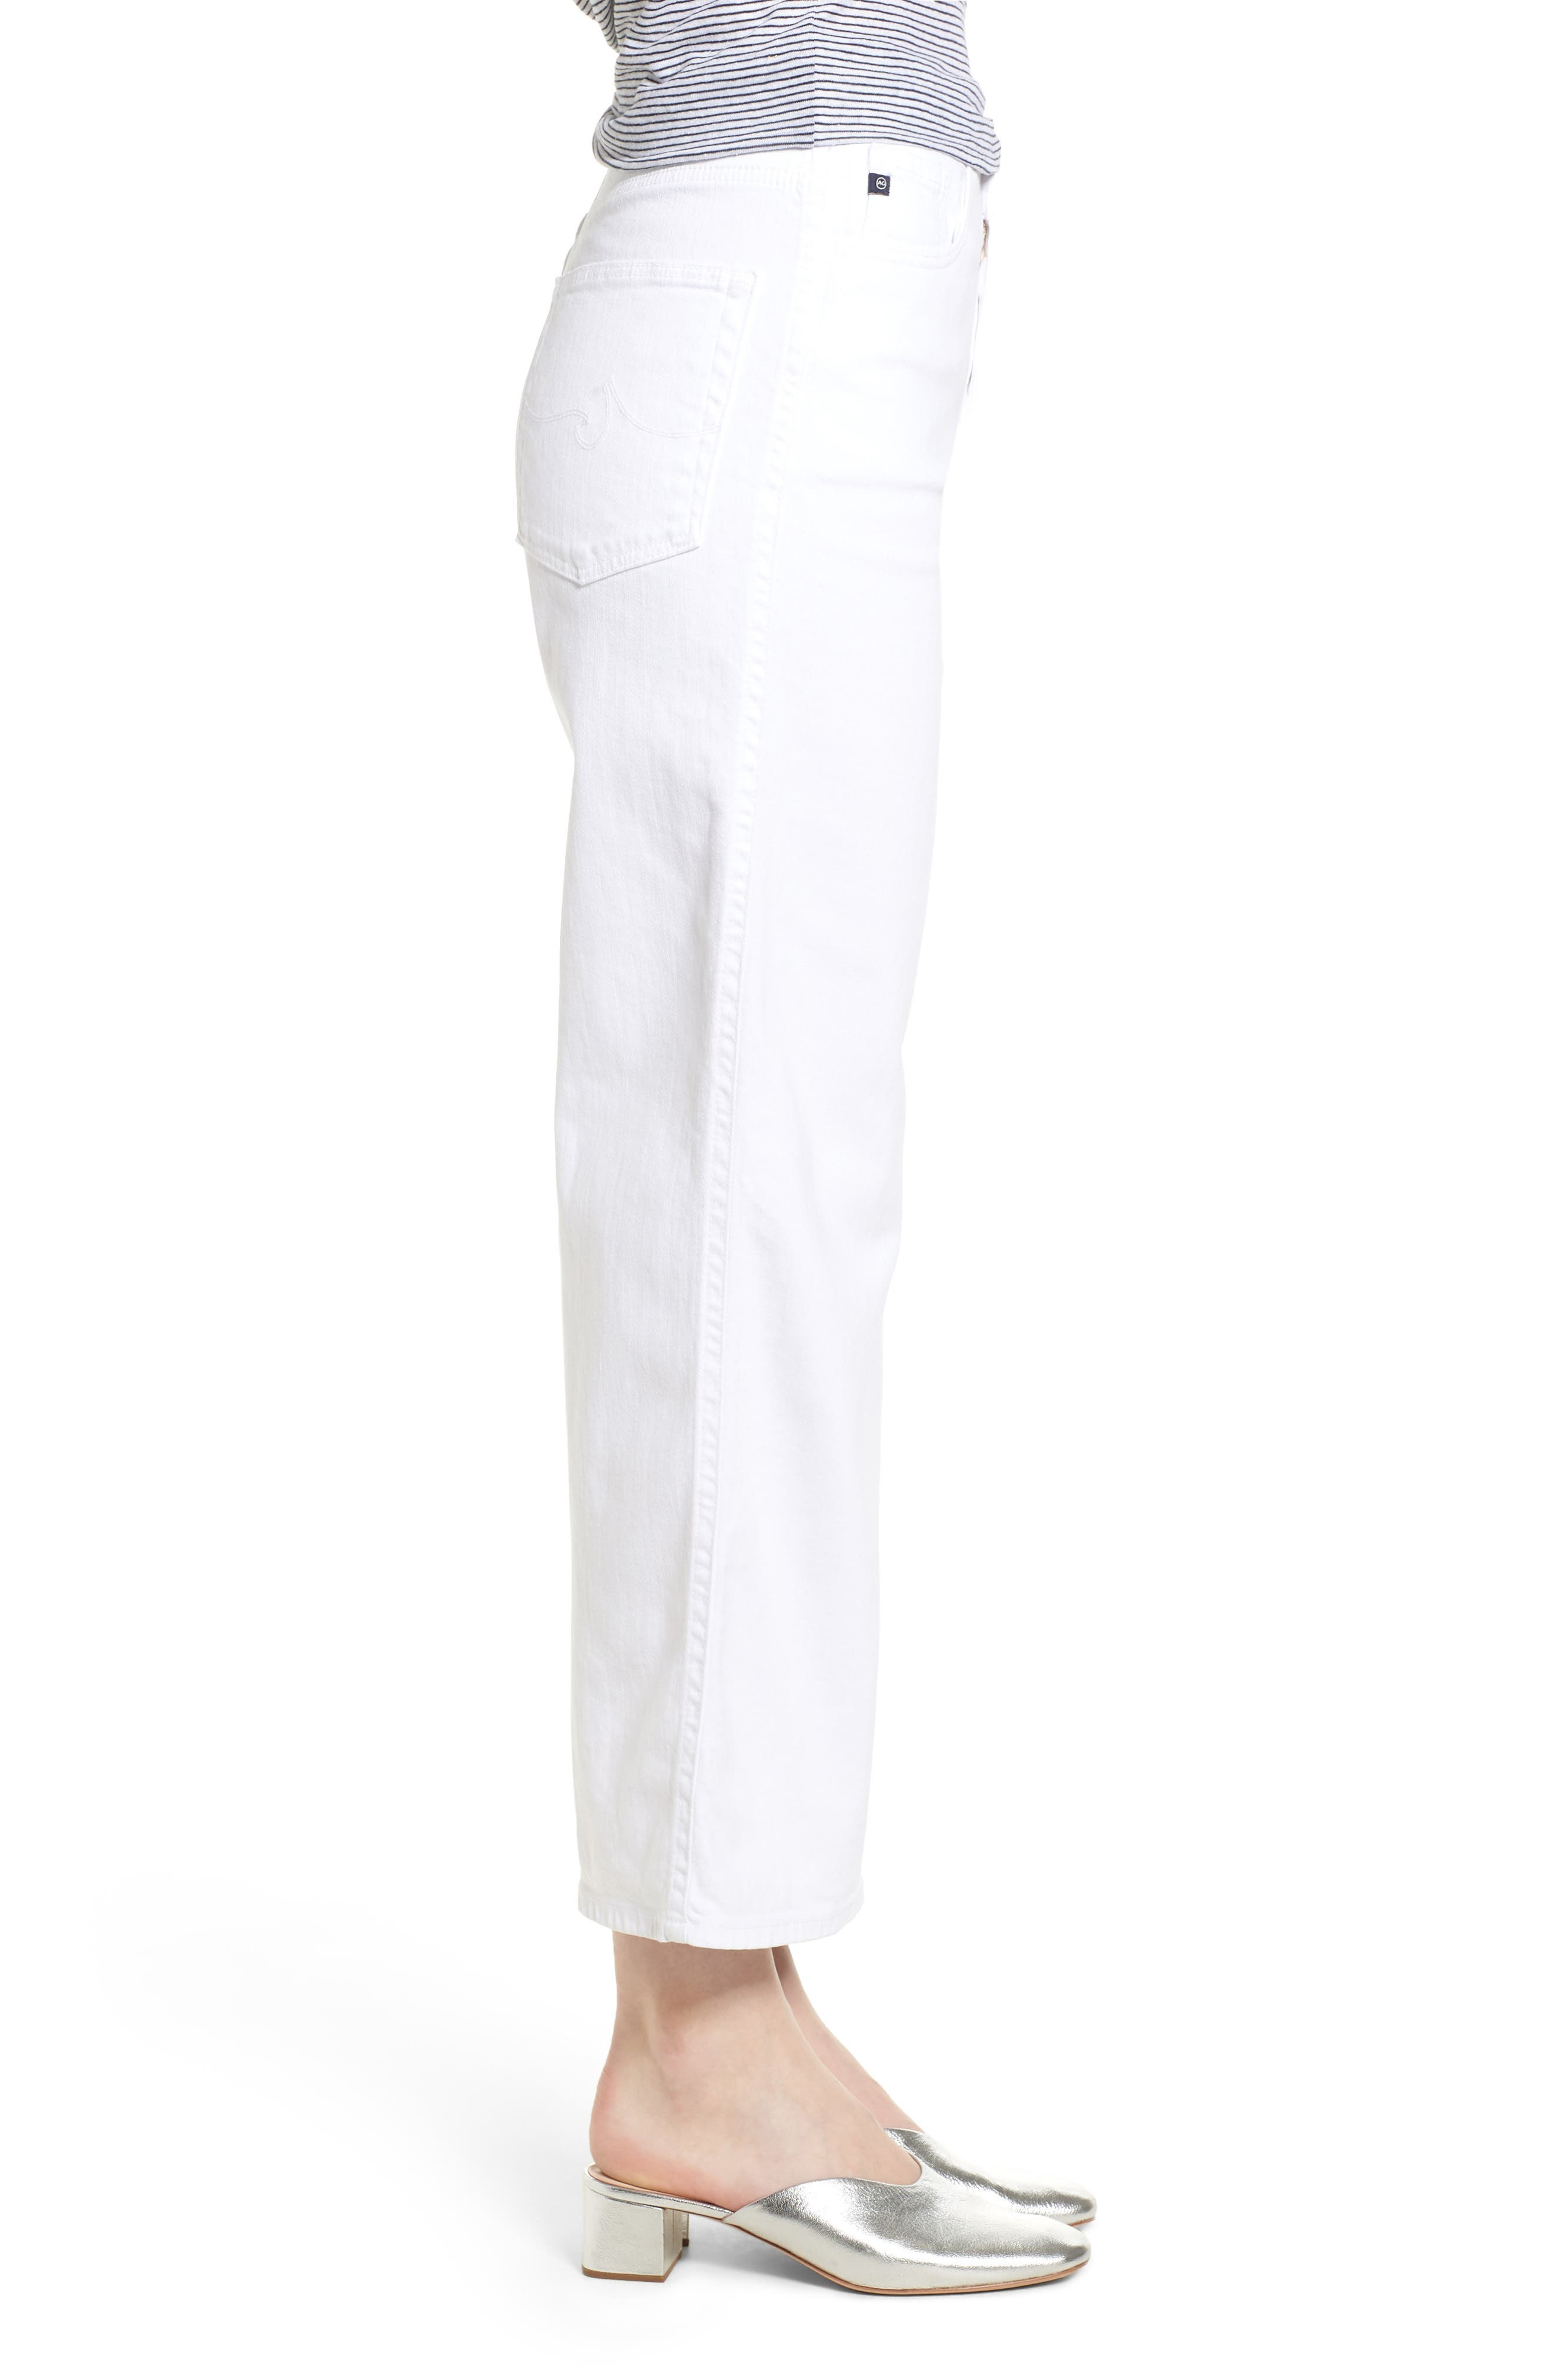 Etta High Waist Crop Wide Leg Jeans,                             Alternate thumbnail 3, color,                             White